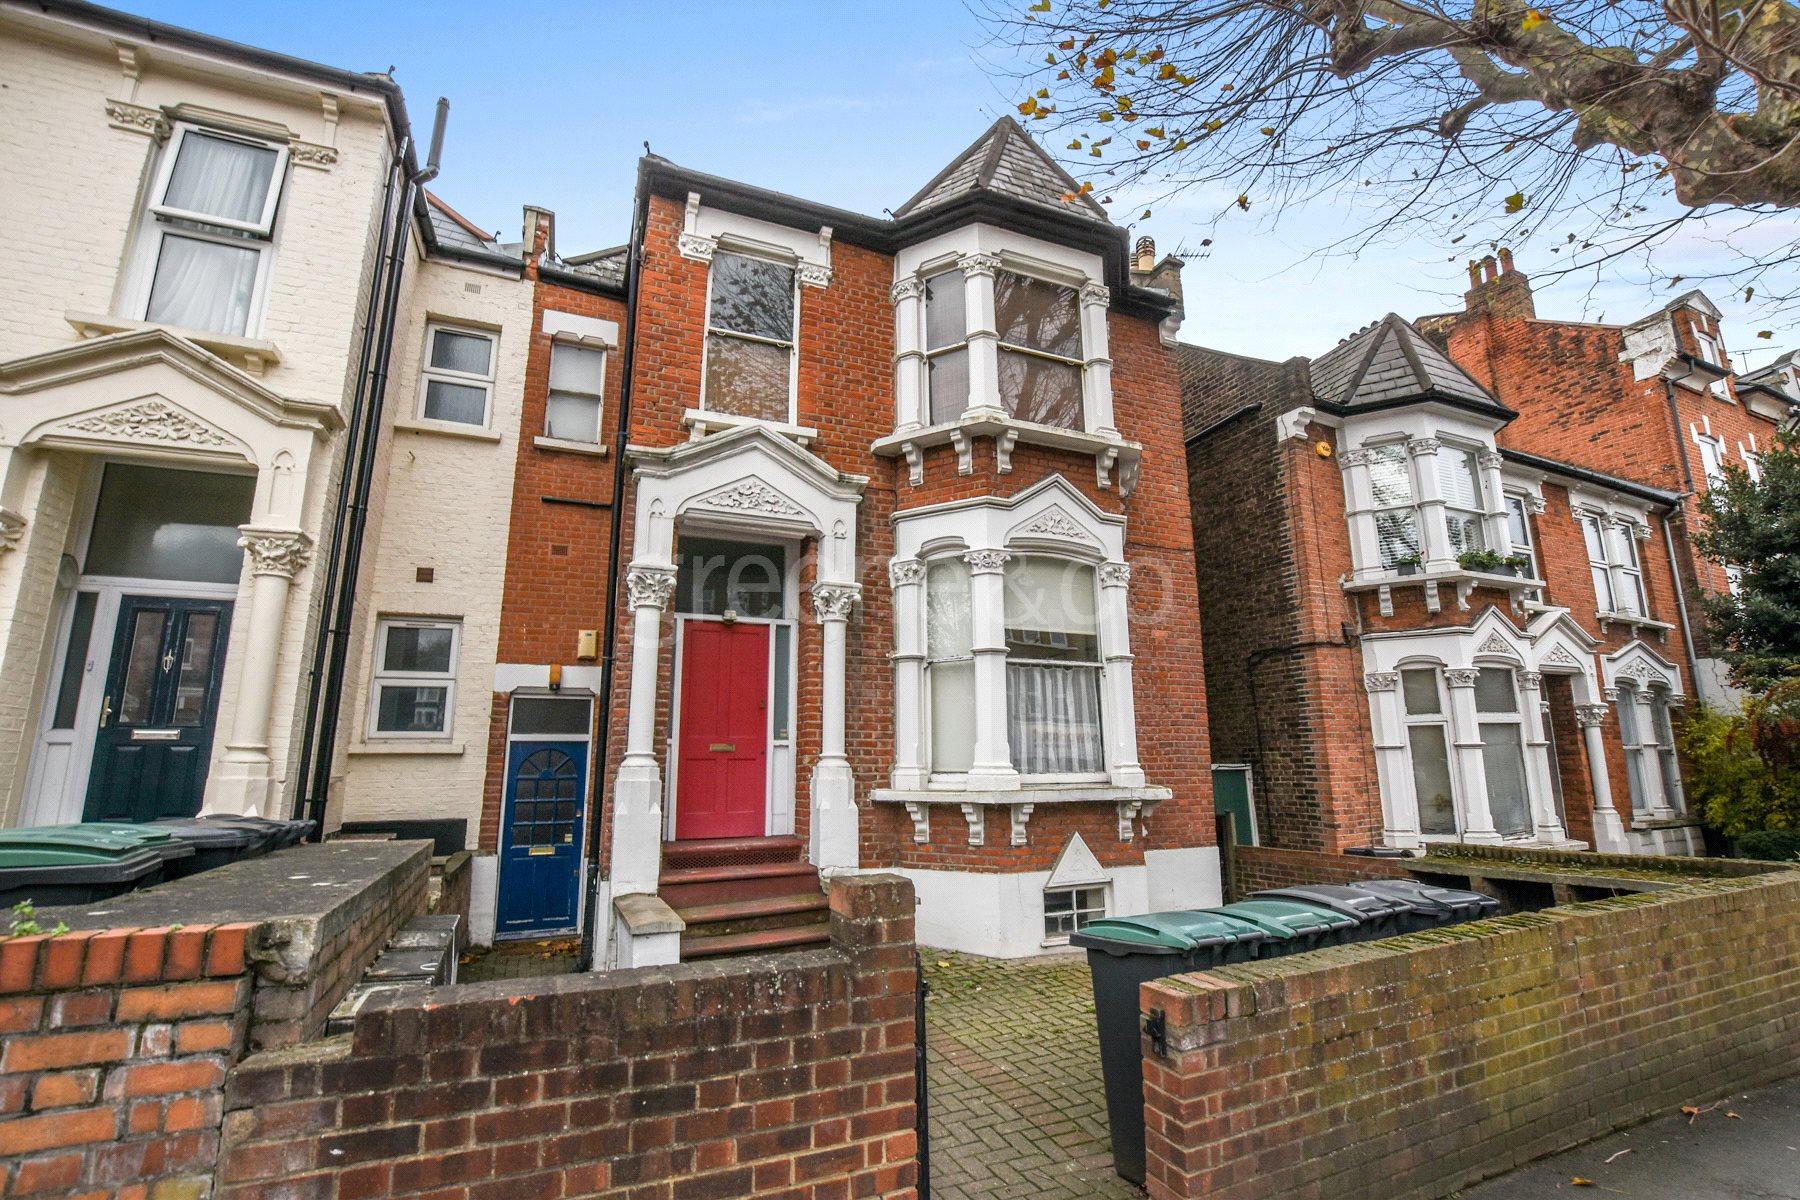 2 Bedrooms Flat for sale in Ferme Park Road, Stroud Green, London, N4